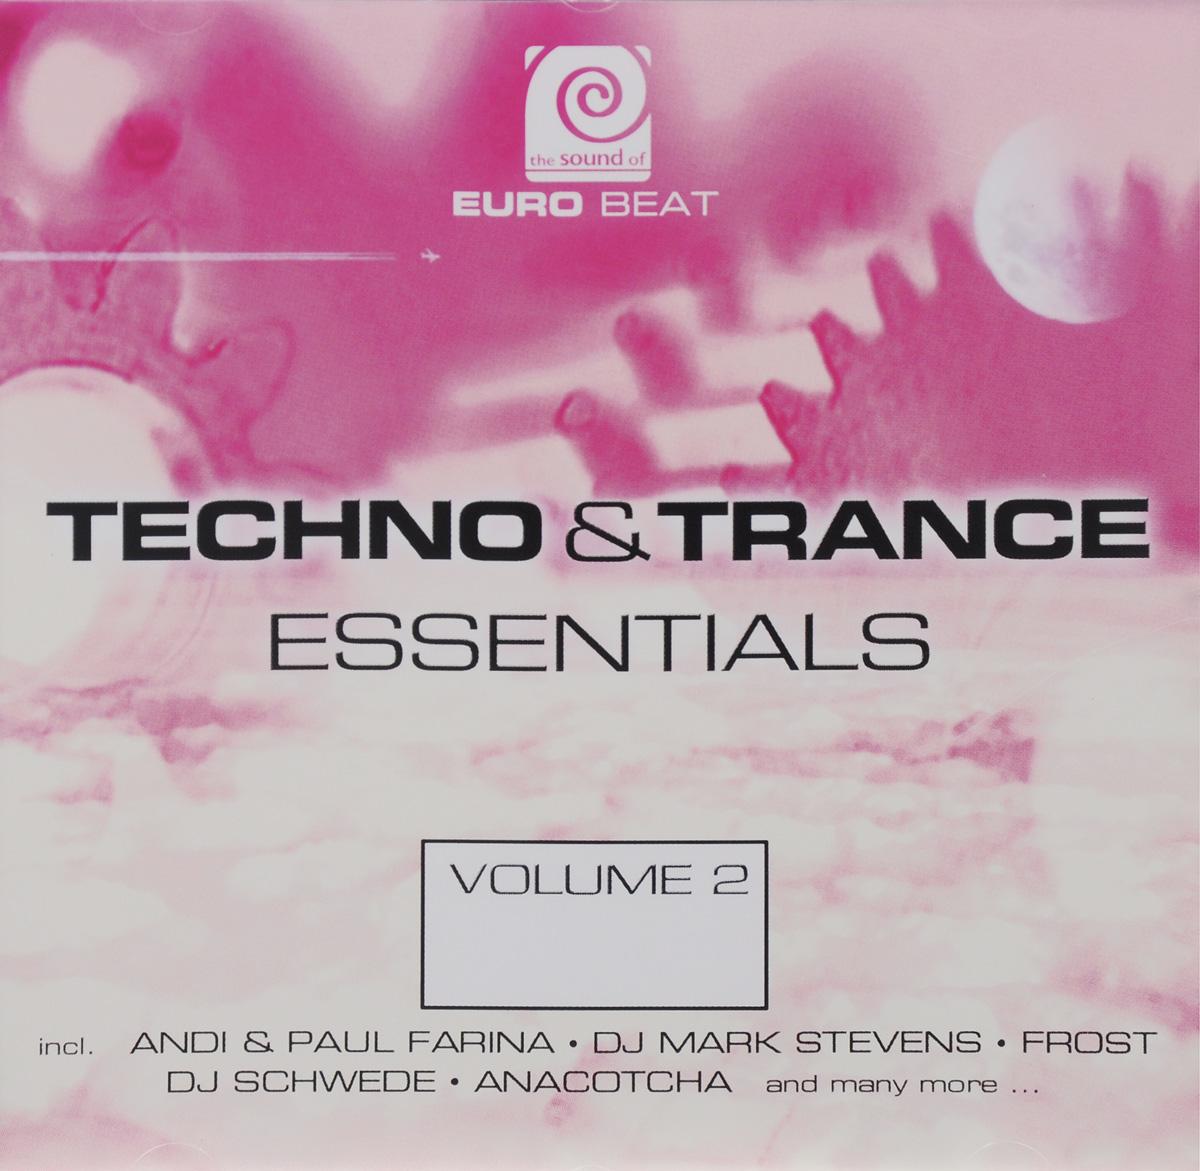 Euro Beat - Techno & Trance Essentials Volume 2 амлодипин таб 10мг 30